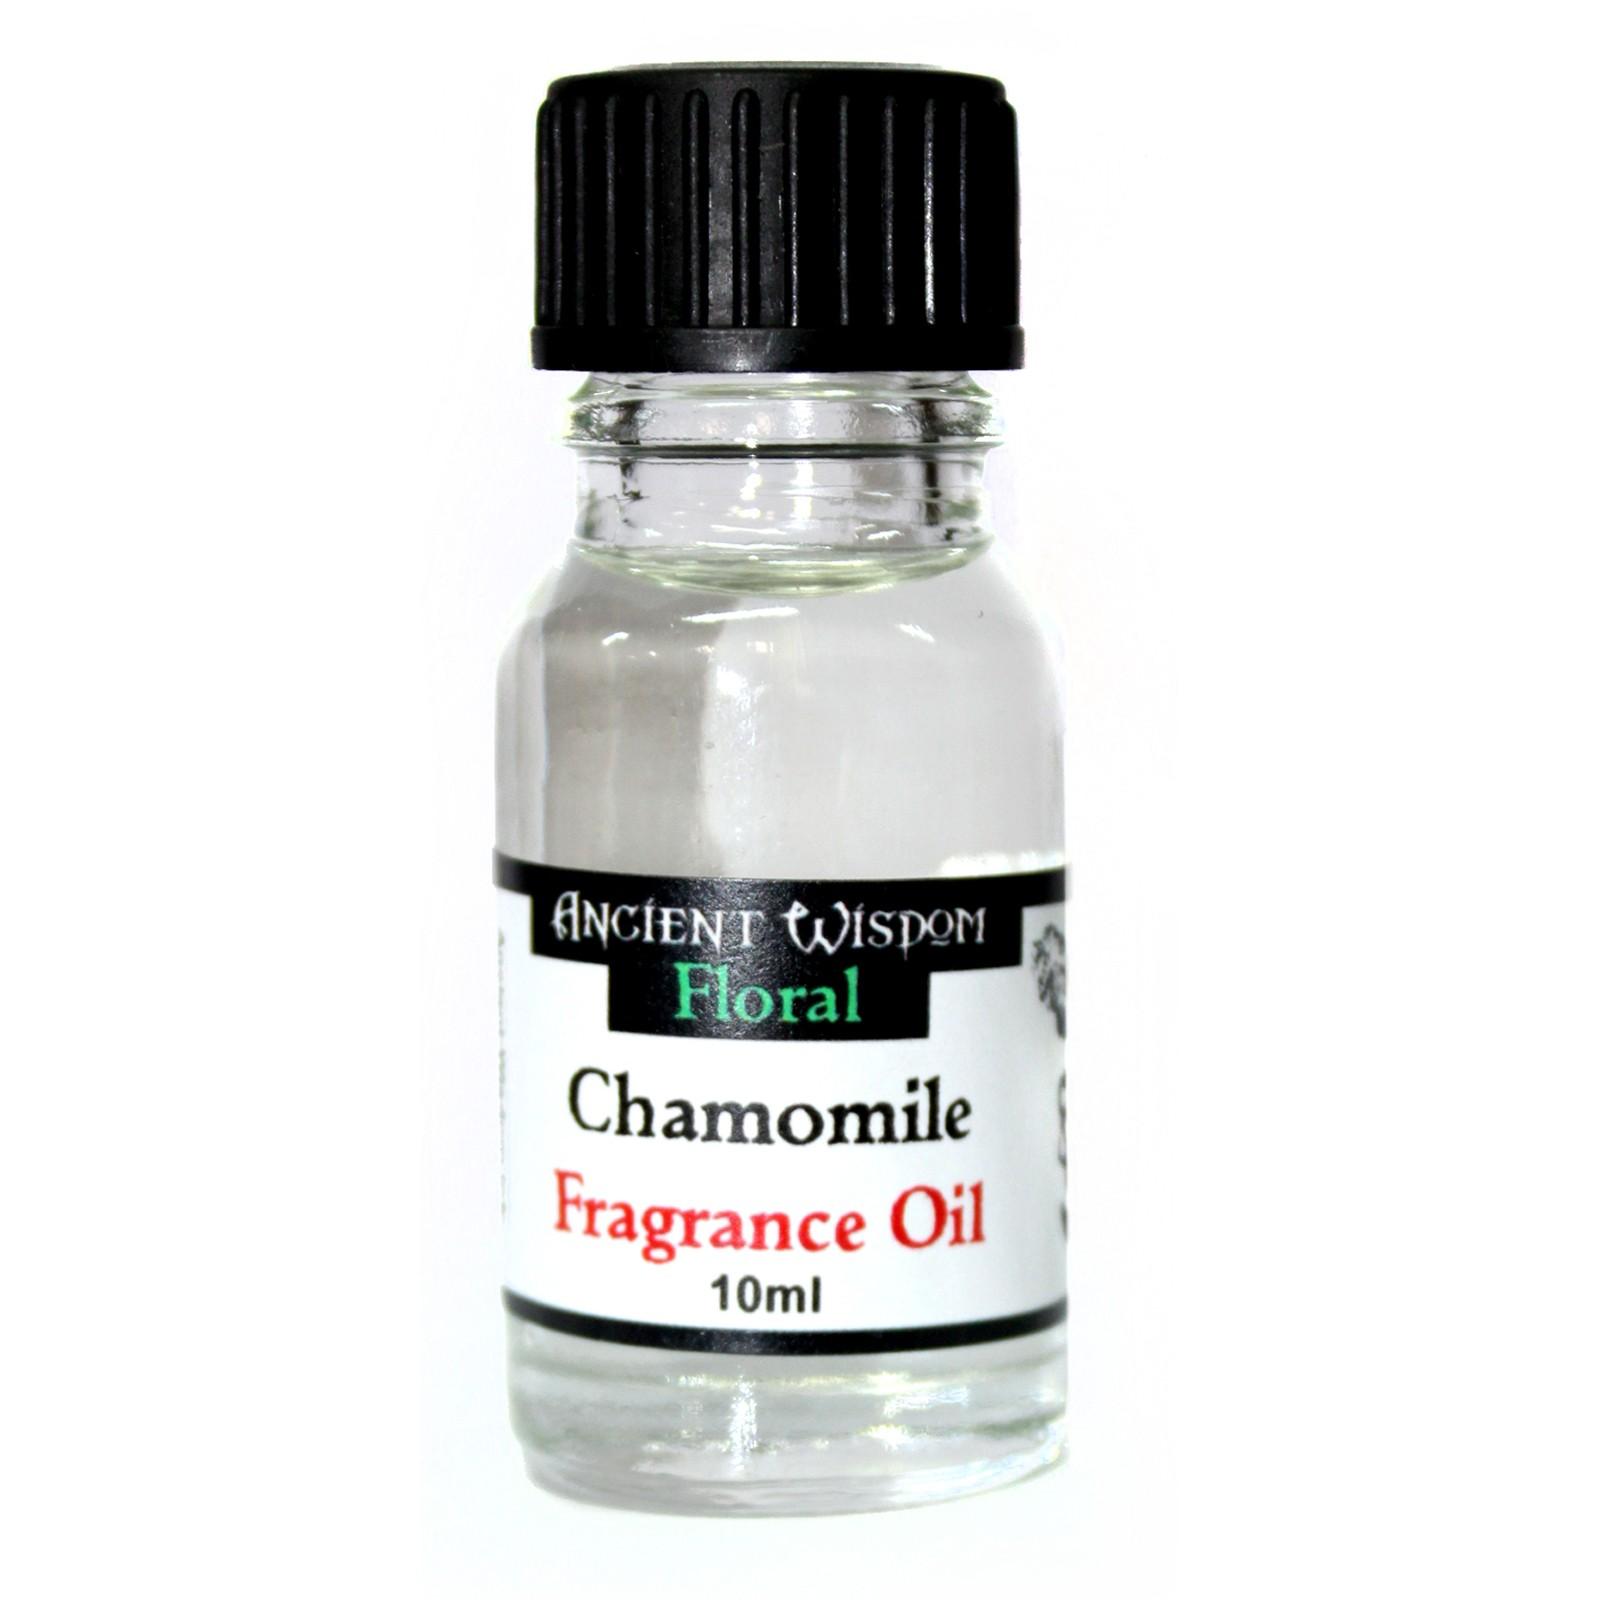 10ml Chamomile Fragrance Oil